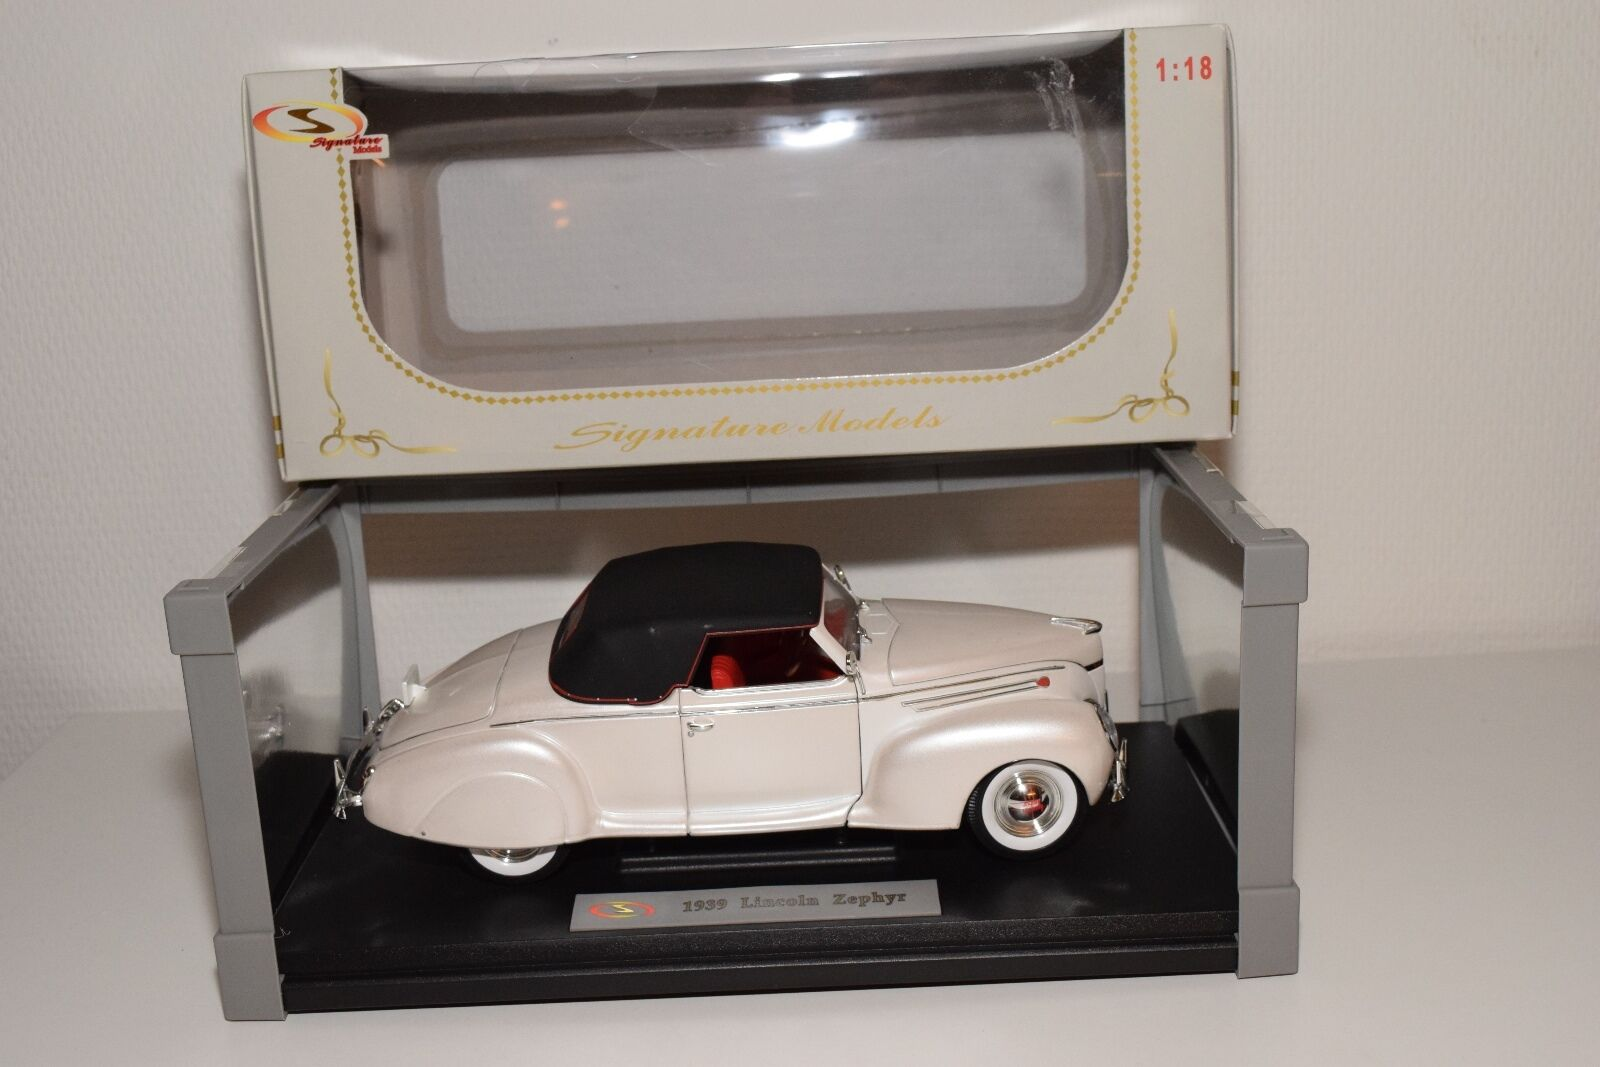 SIGNATURE MODELS LINCOLN ZEPHYR 1939 CREAM MINT BOXED bcd9a8